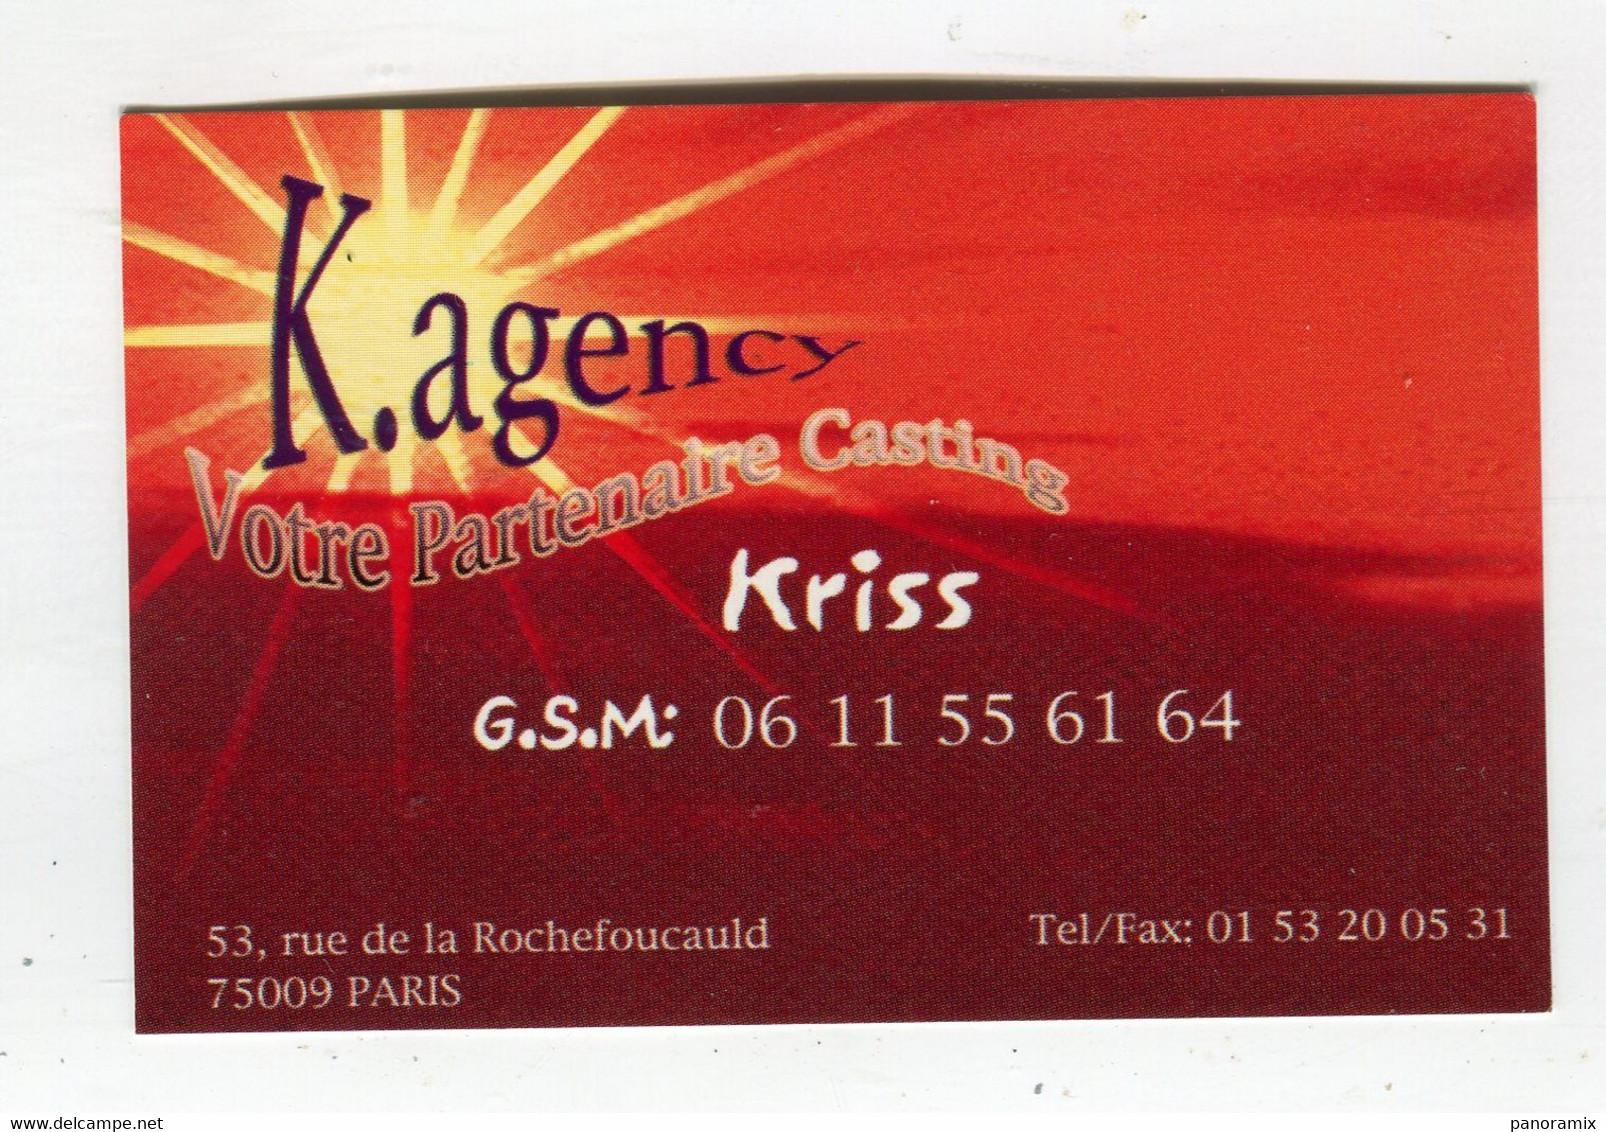 Carte De Visite °_ Carton-K.Agency-Partenaire Casting-Kriss-75009 - Visiting Cards